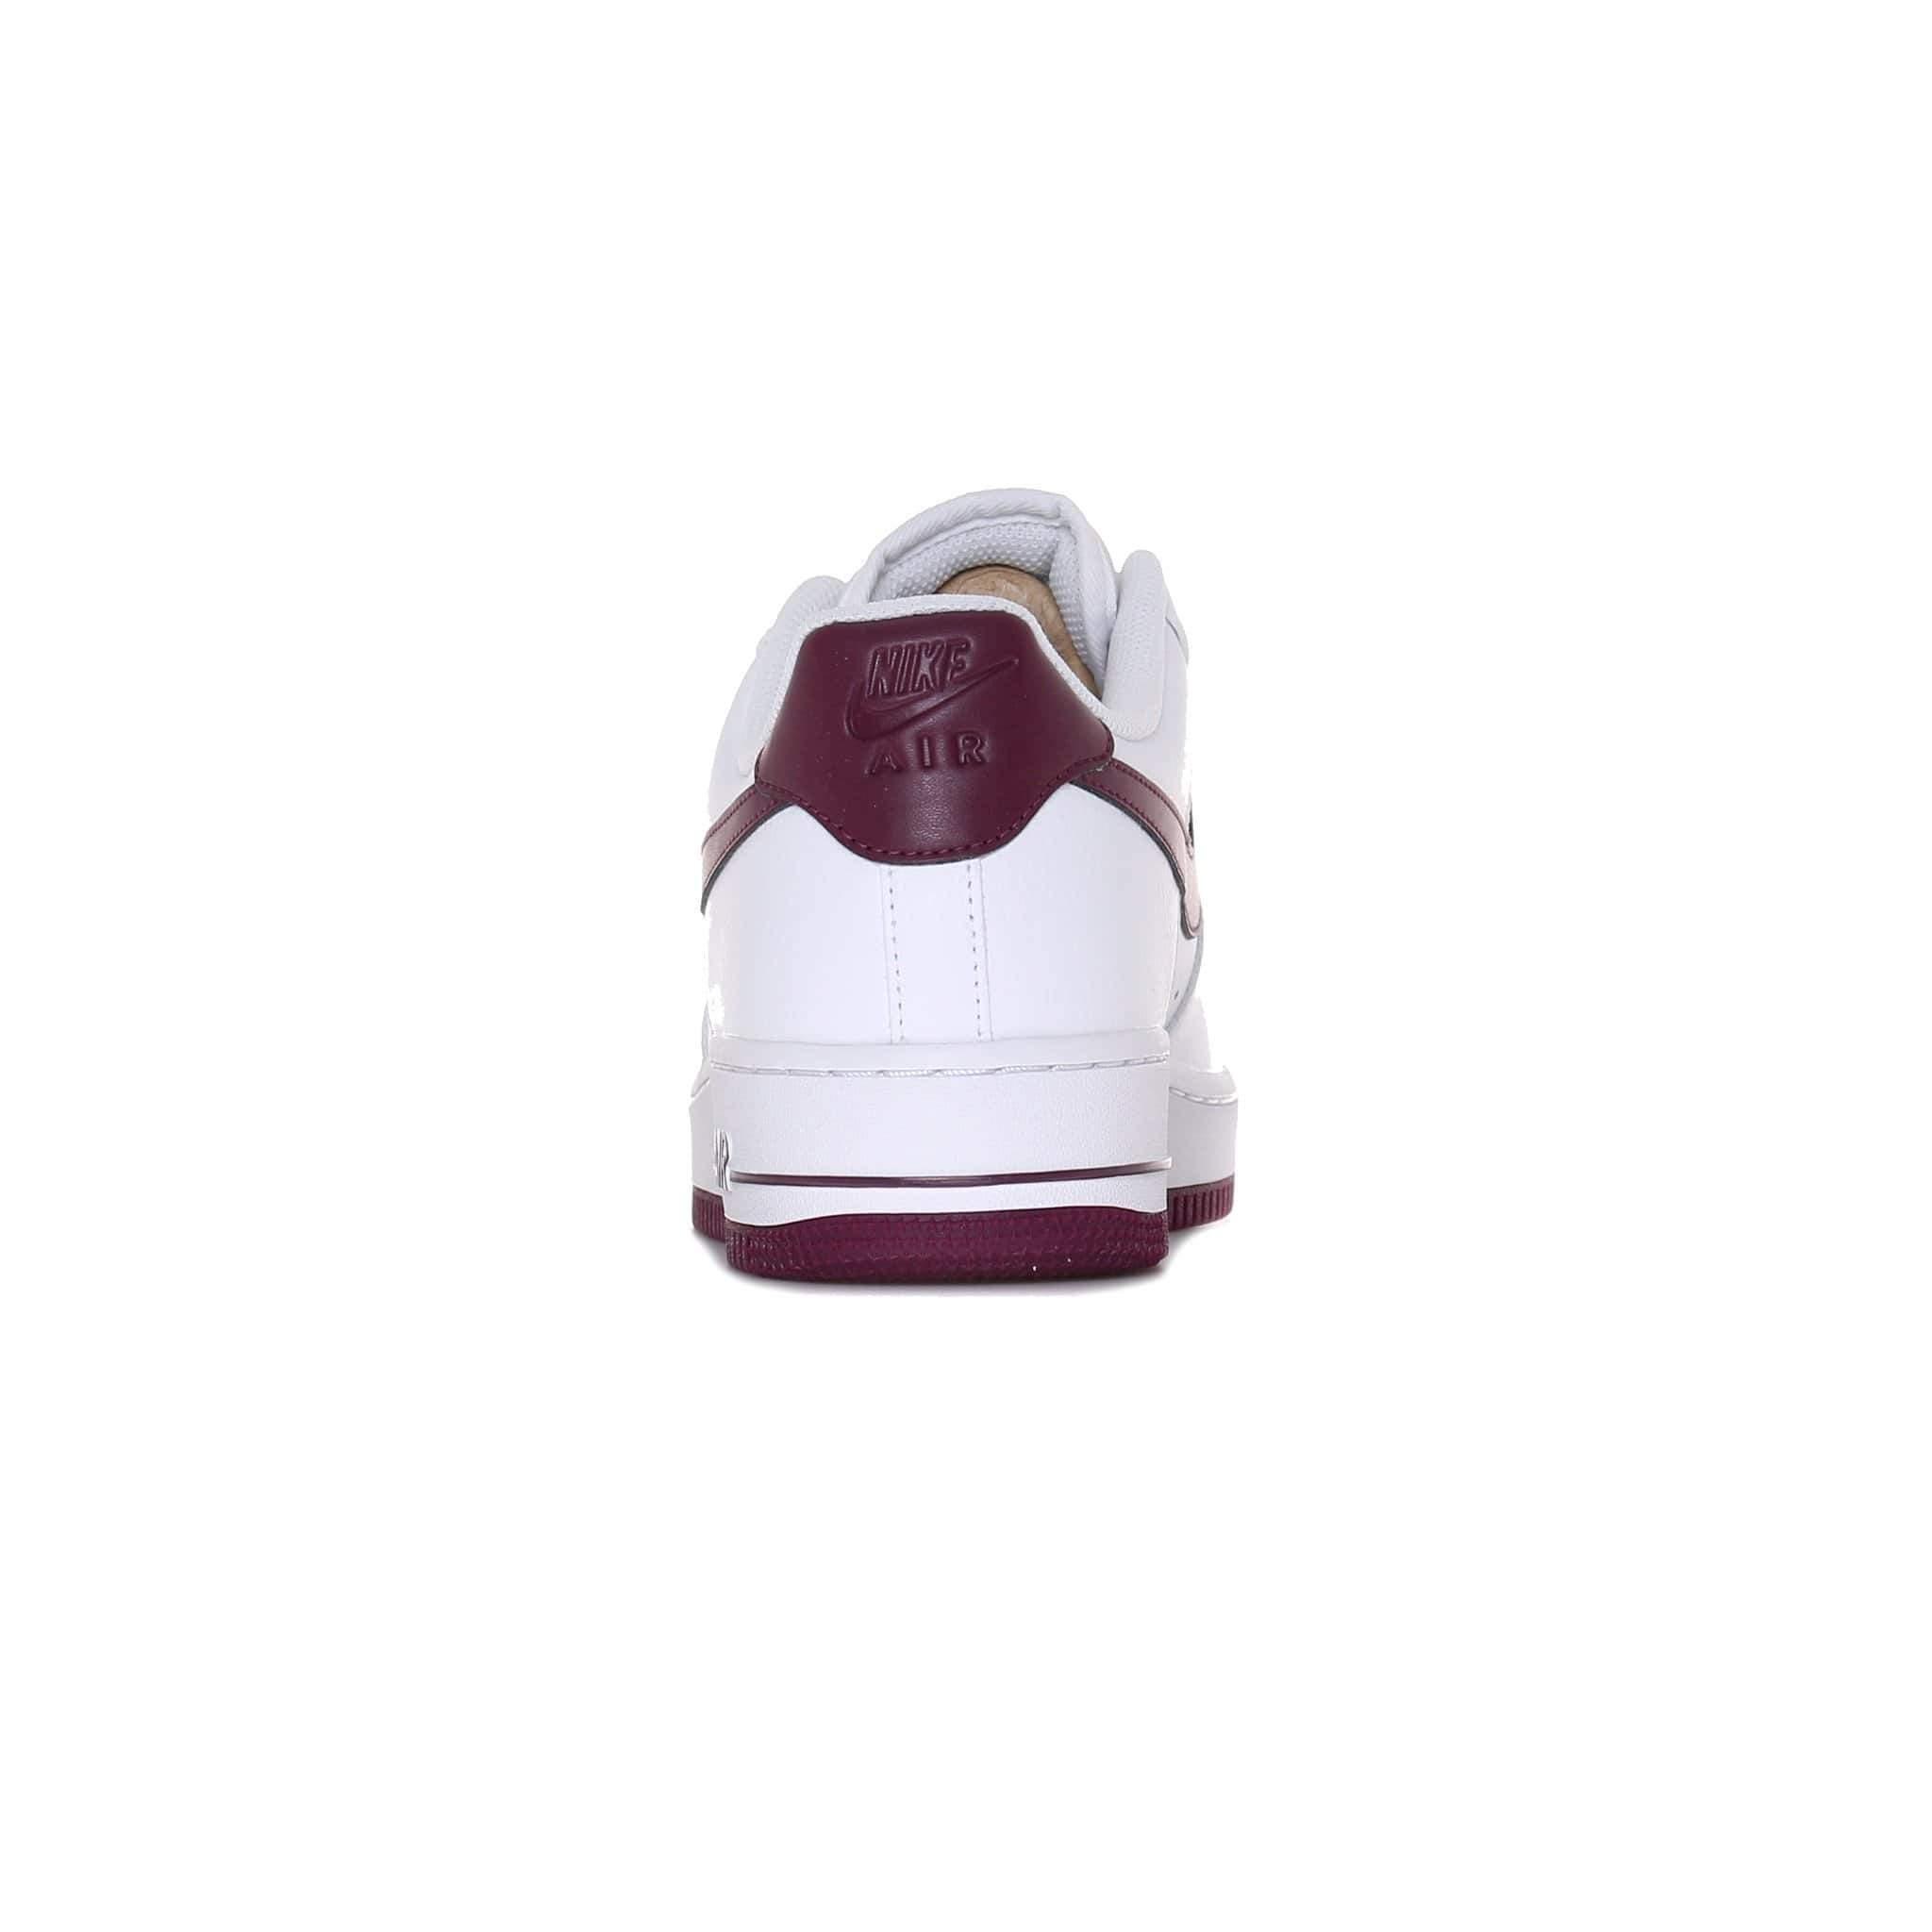 Nike Wmns Air Force 1 '07 Patent White Bordeaux UK 3